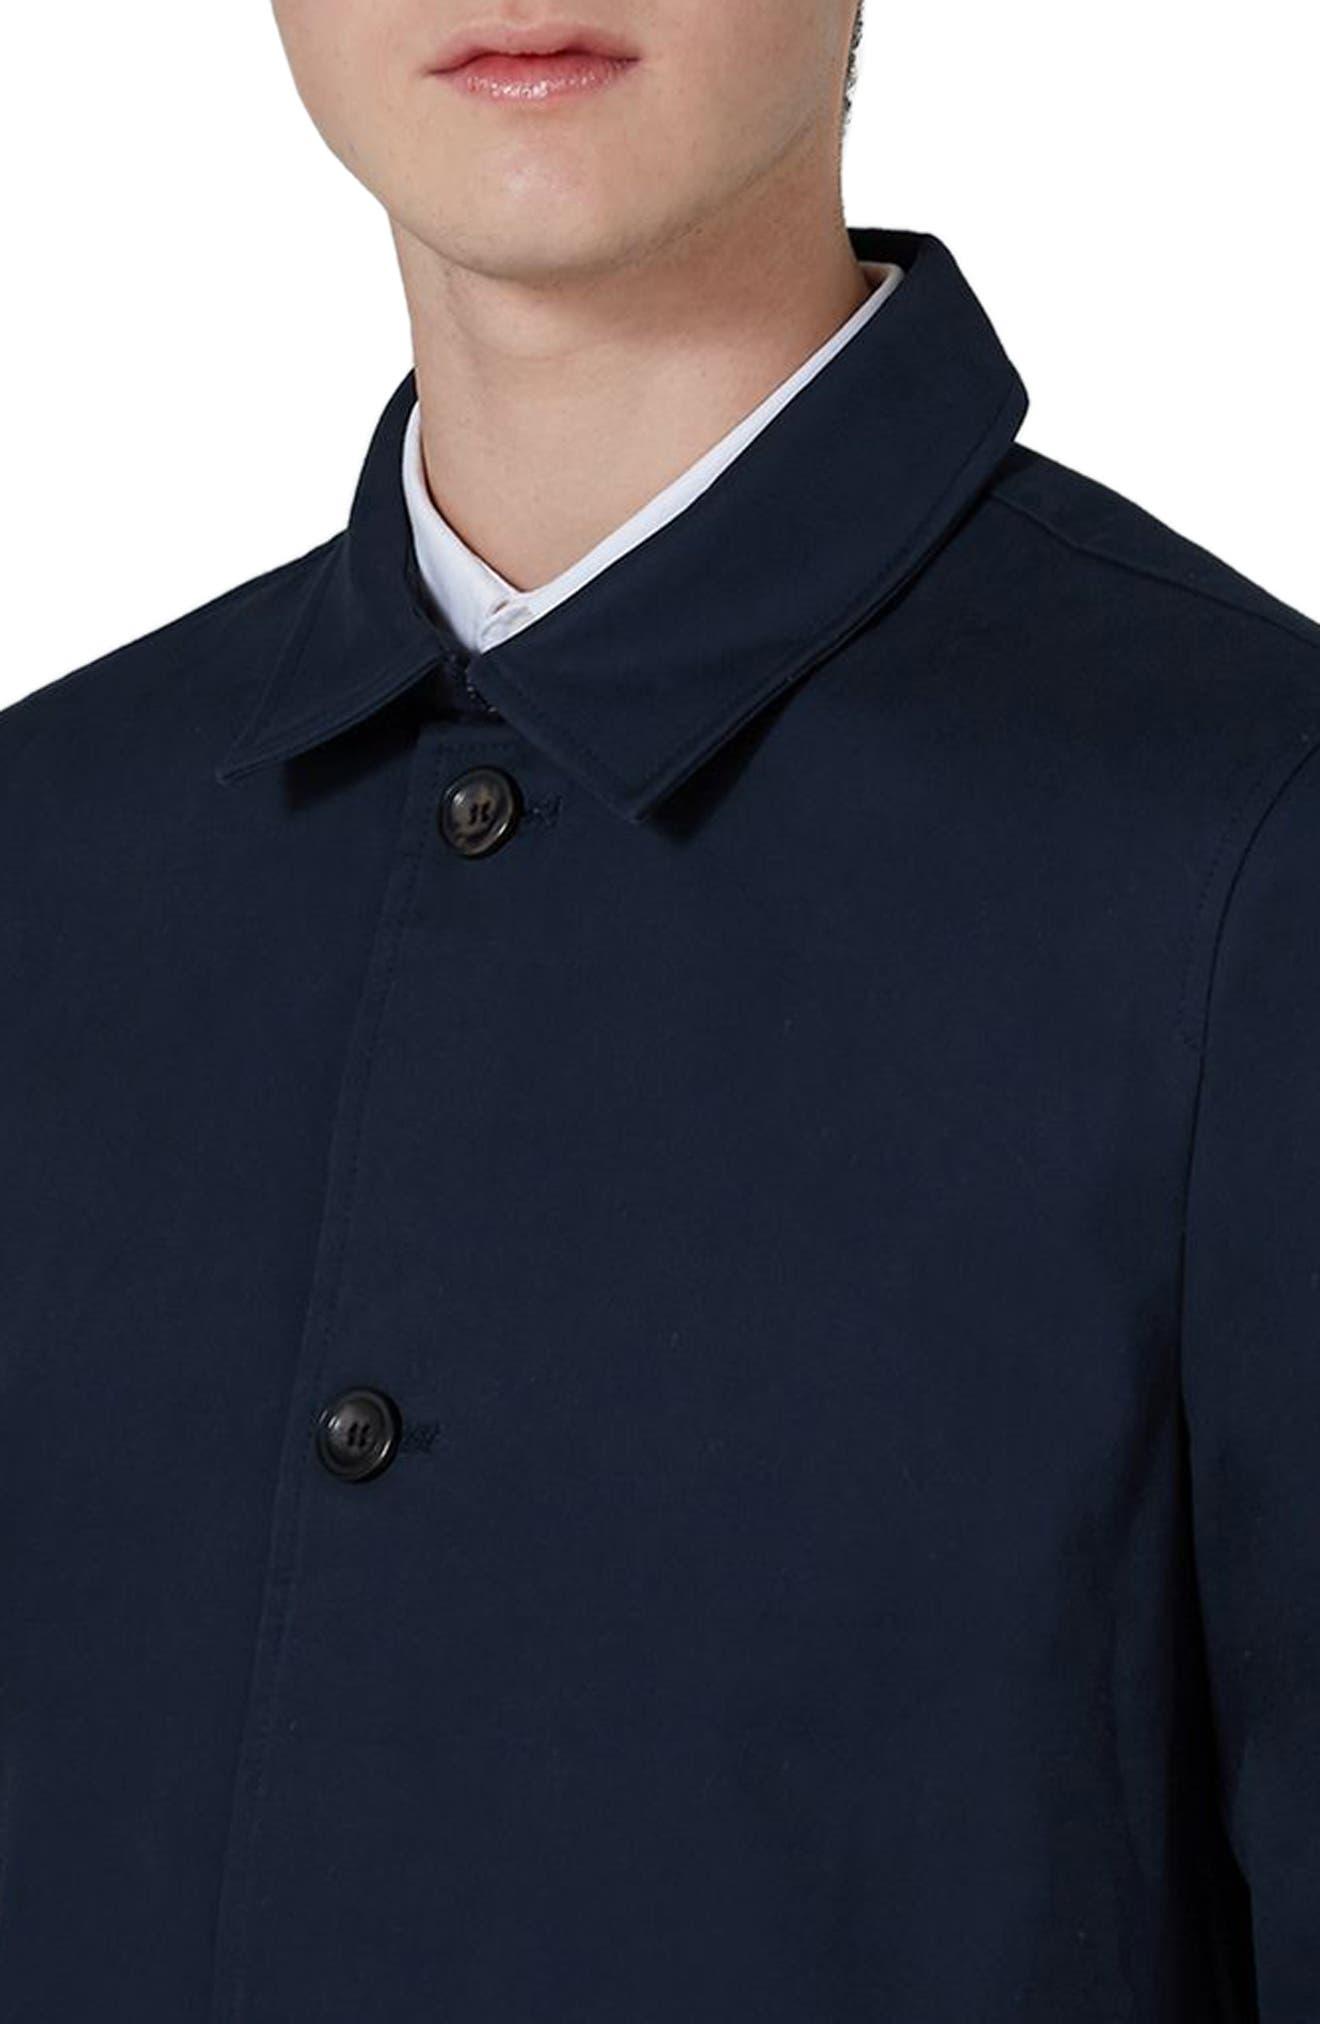 Single Breasted Topcoat,                             Alternate thumbnail 3, color,                             Dark Blue